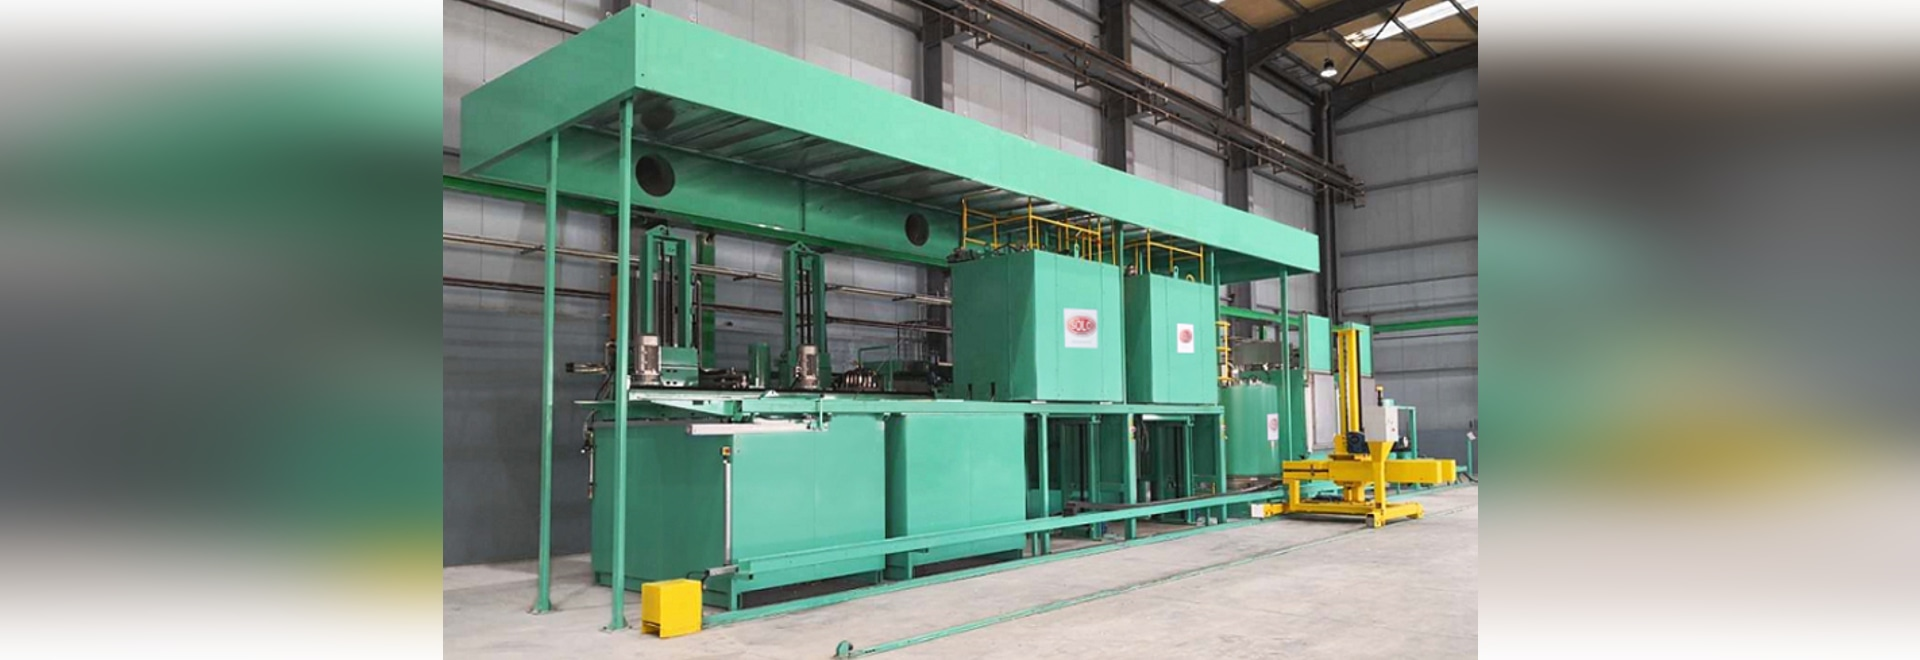 SOLO Swiss batch furnace Profitherm P300 shipped to Algeria